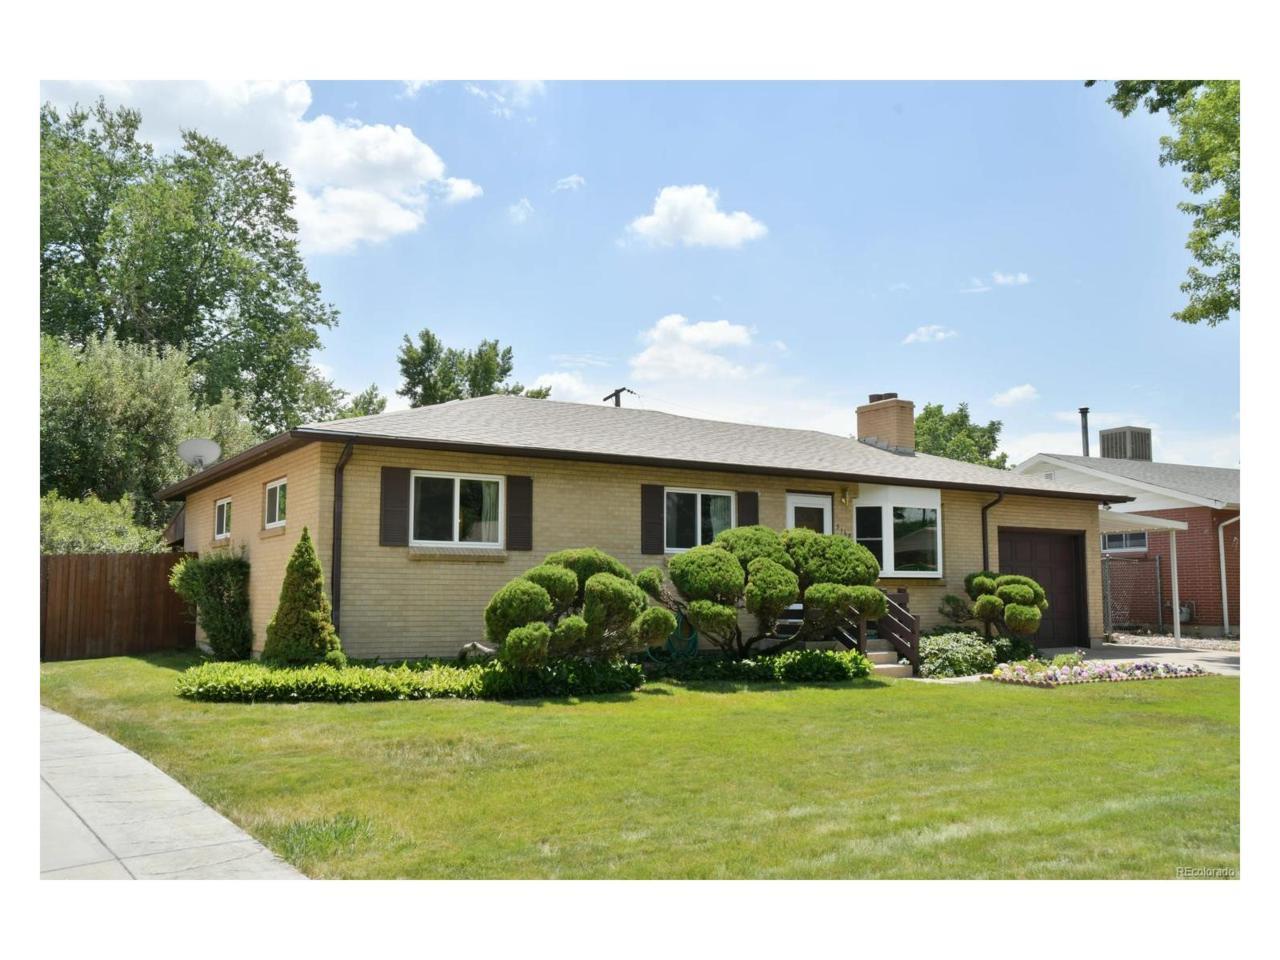 5168 W Columbia Place, Denver, CO 80236 (MLS #4206190) :: 8z Real Estate